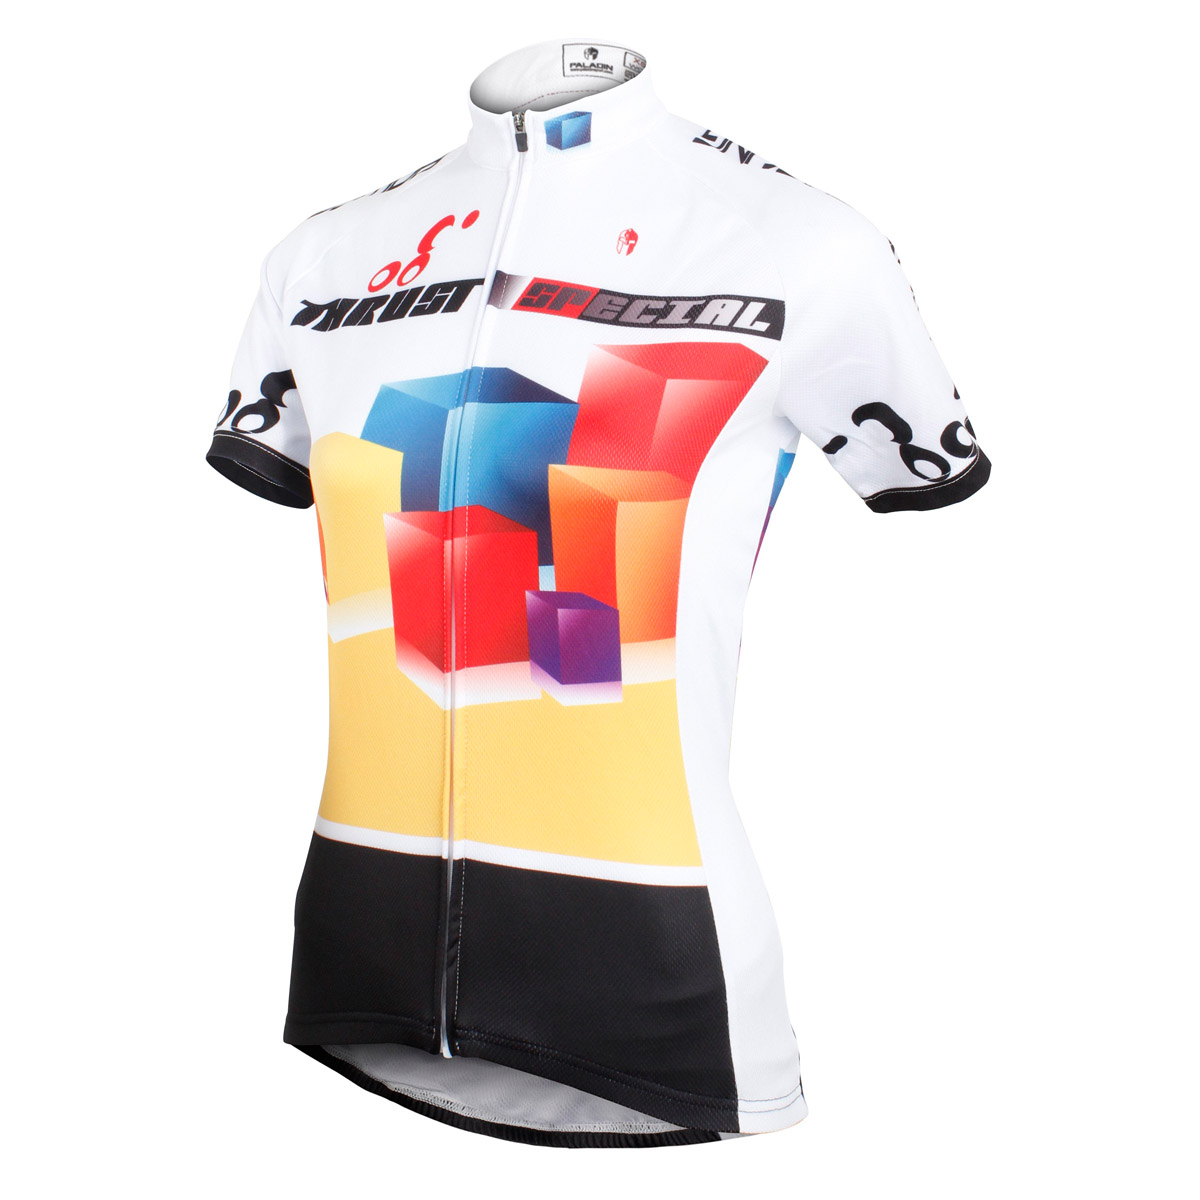 check out 4fd6e fdb92 Original design muticolor 3D cubi ciclismo maglie per ...